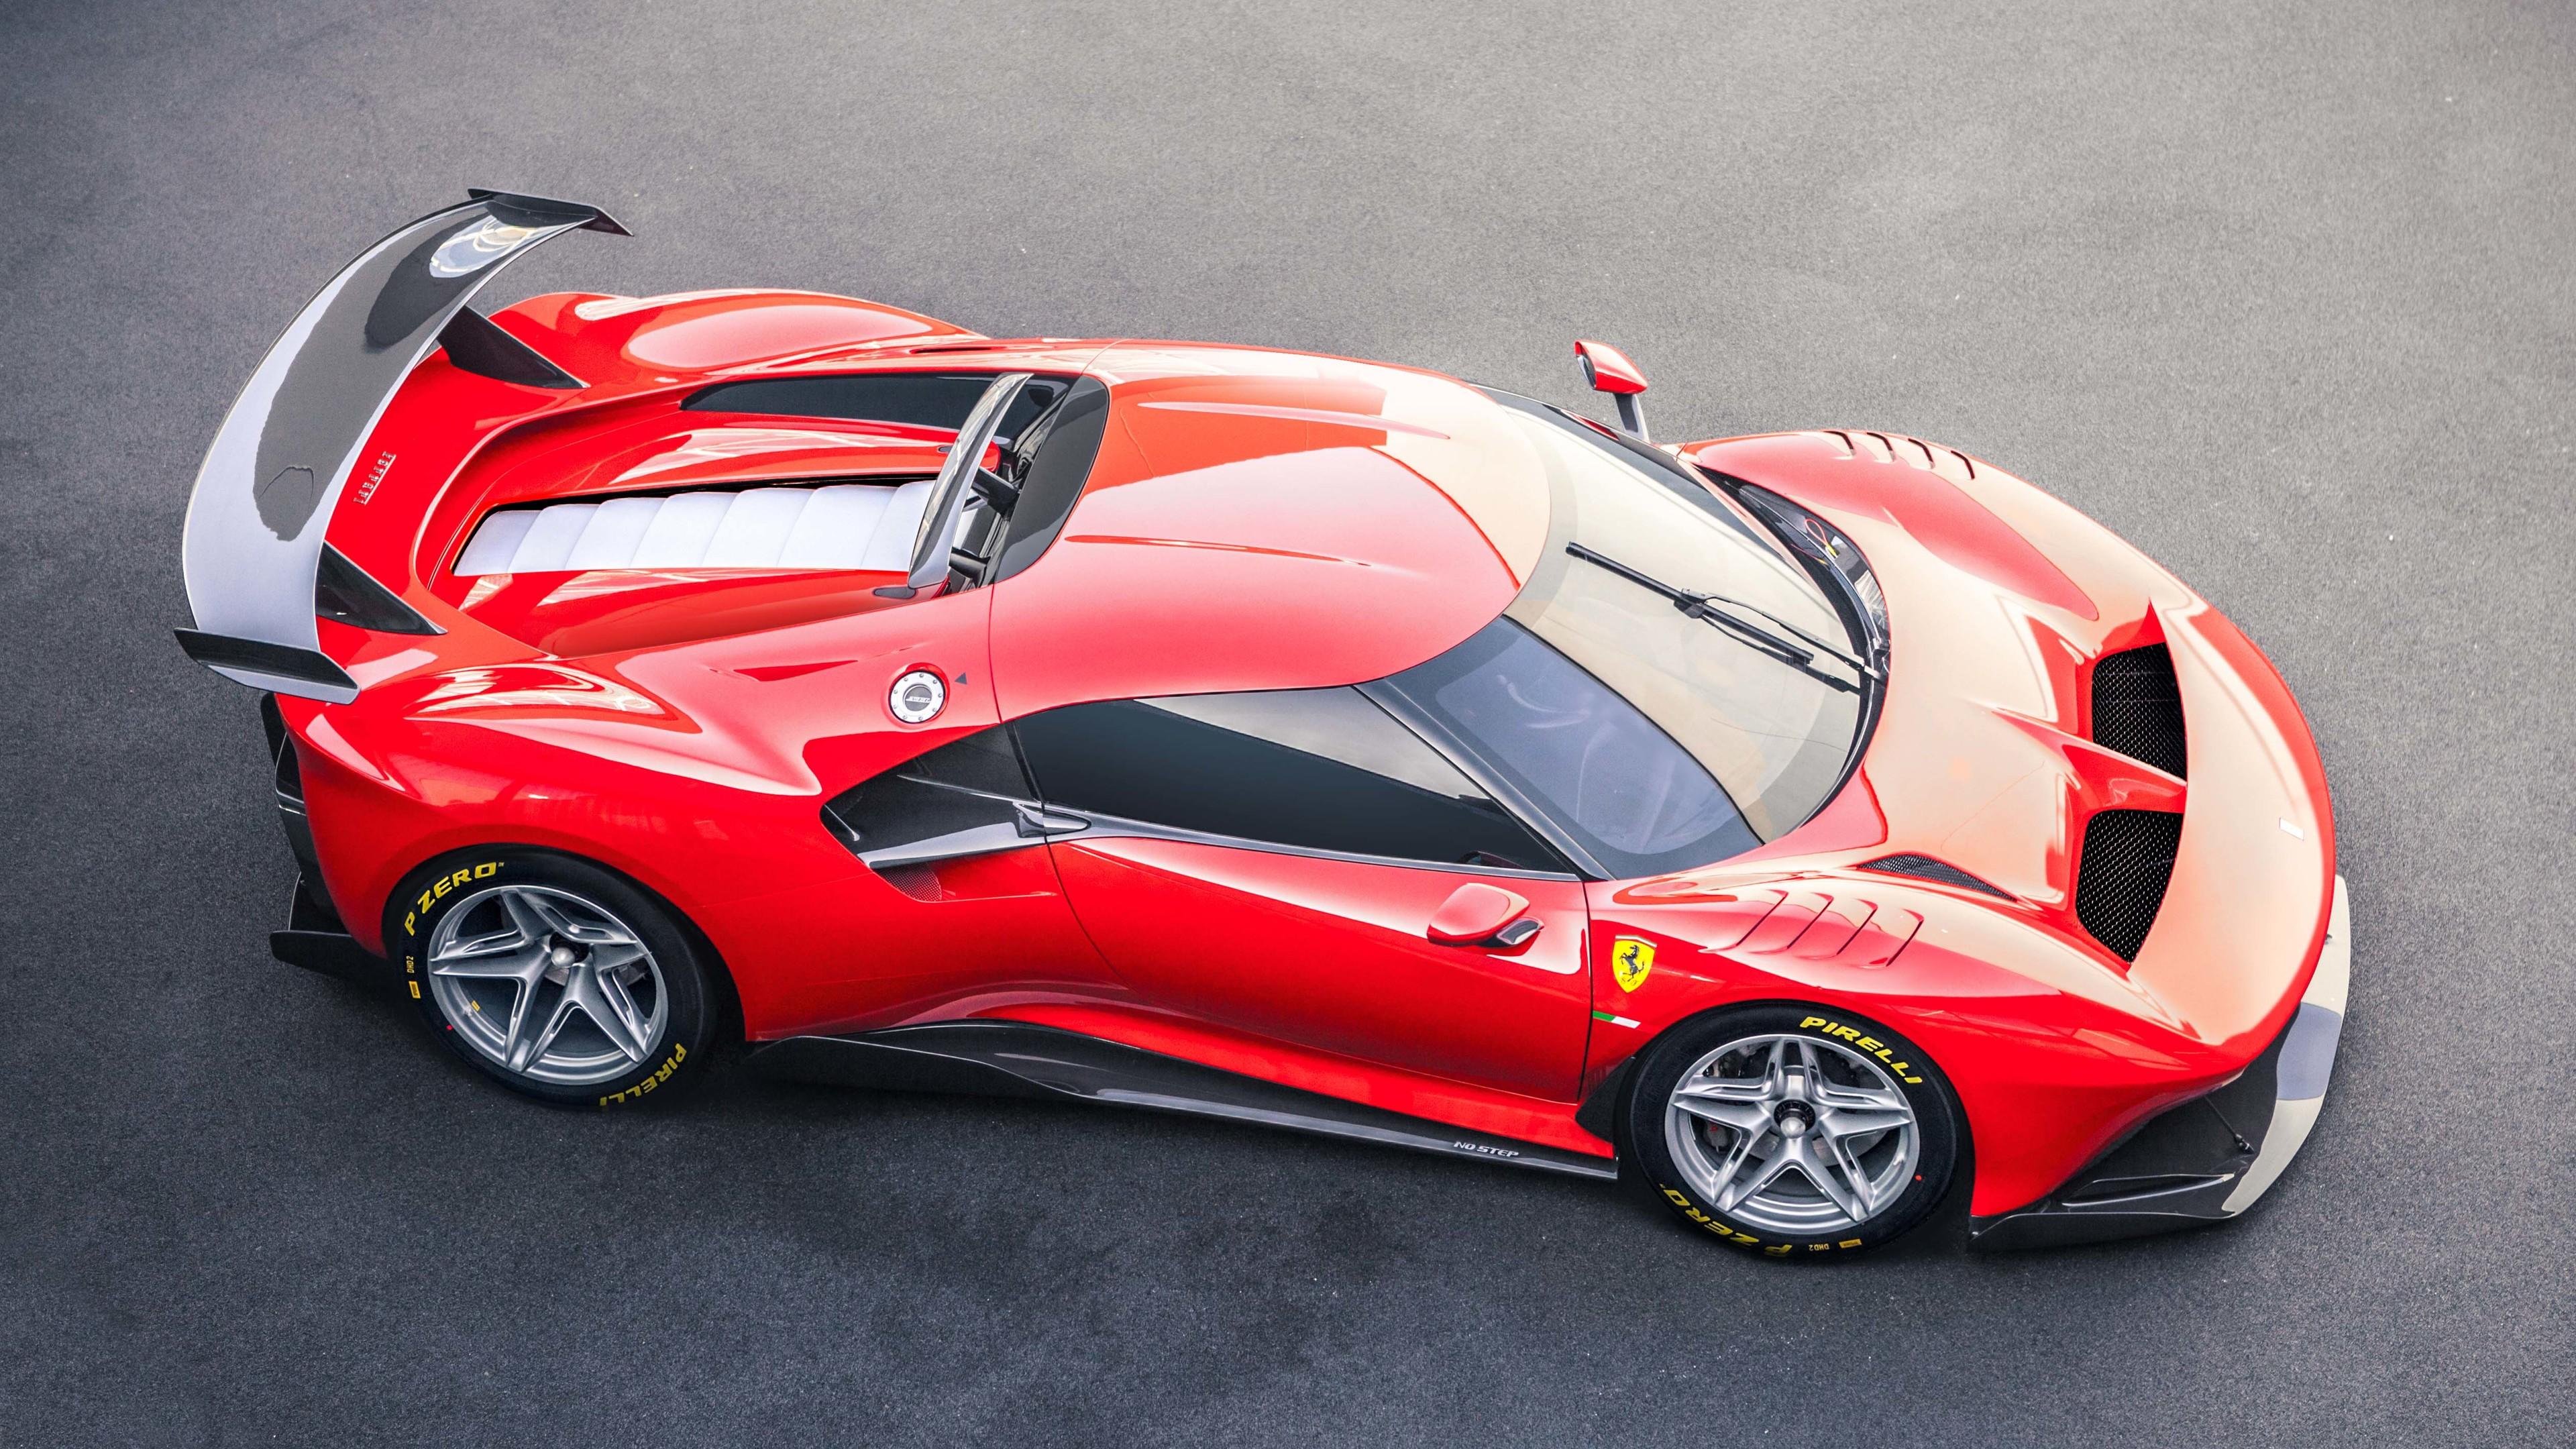 ferrari p80 c 4k 2019 1554245251 - Ferrari P80 C 4k 2019 - hd-wallpapers, ferrari wallpapers, ferrari p80 c wallpapers, cars wallpapers, 5k wallpapers, 4k-wallpapers, 2019 cars wallpapers